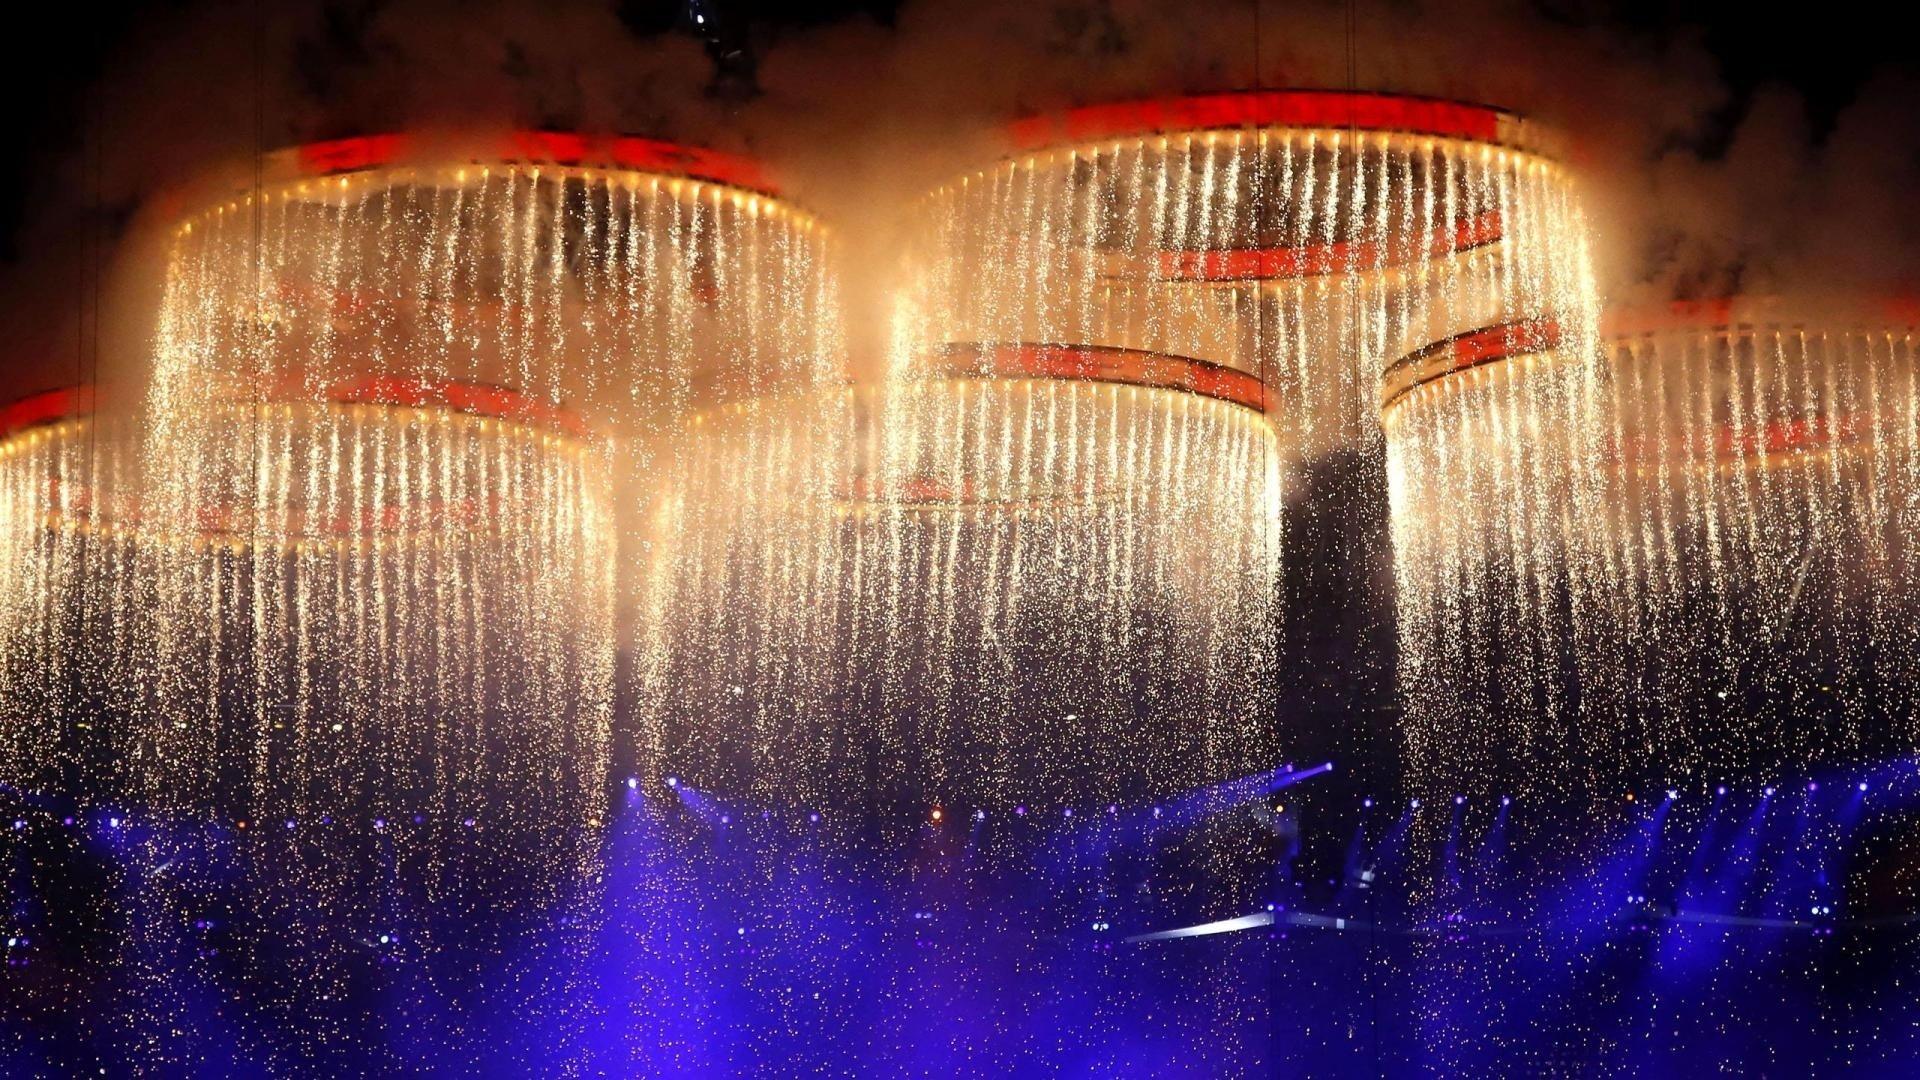 2012 Summer Olympics Opening Ceremony HD Wallpaper